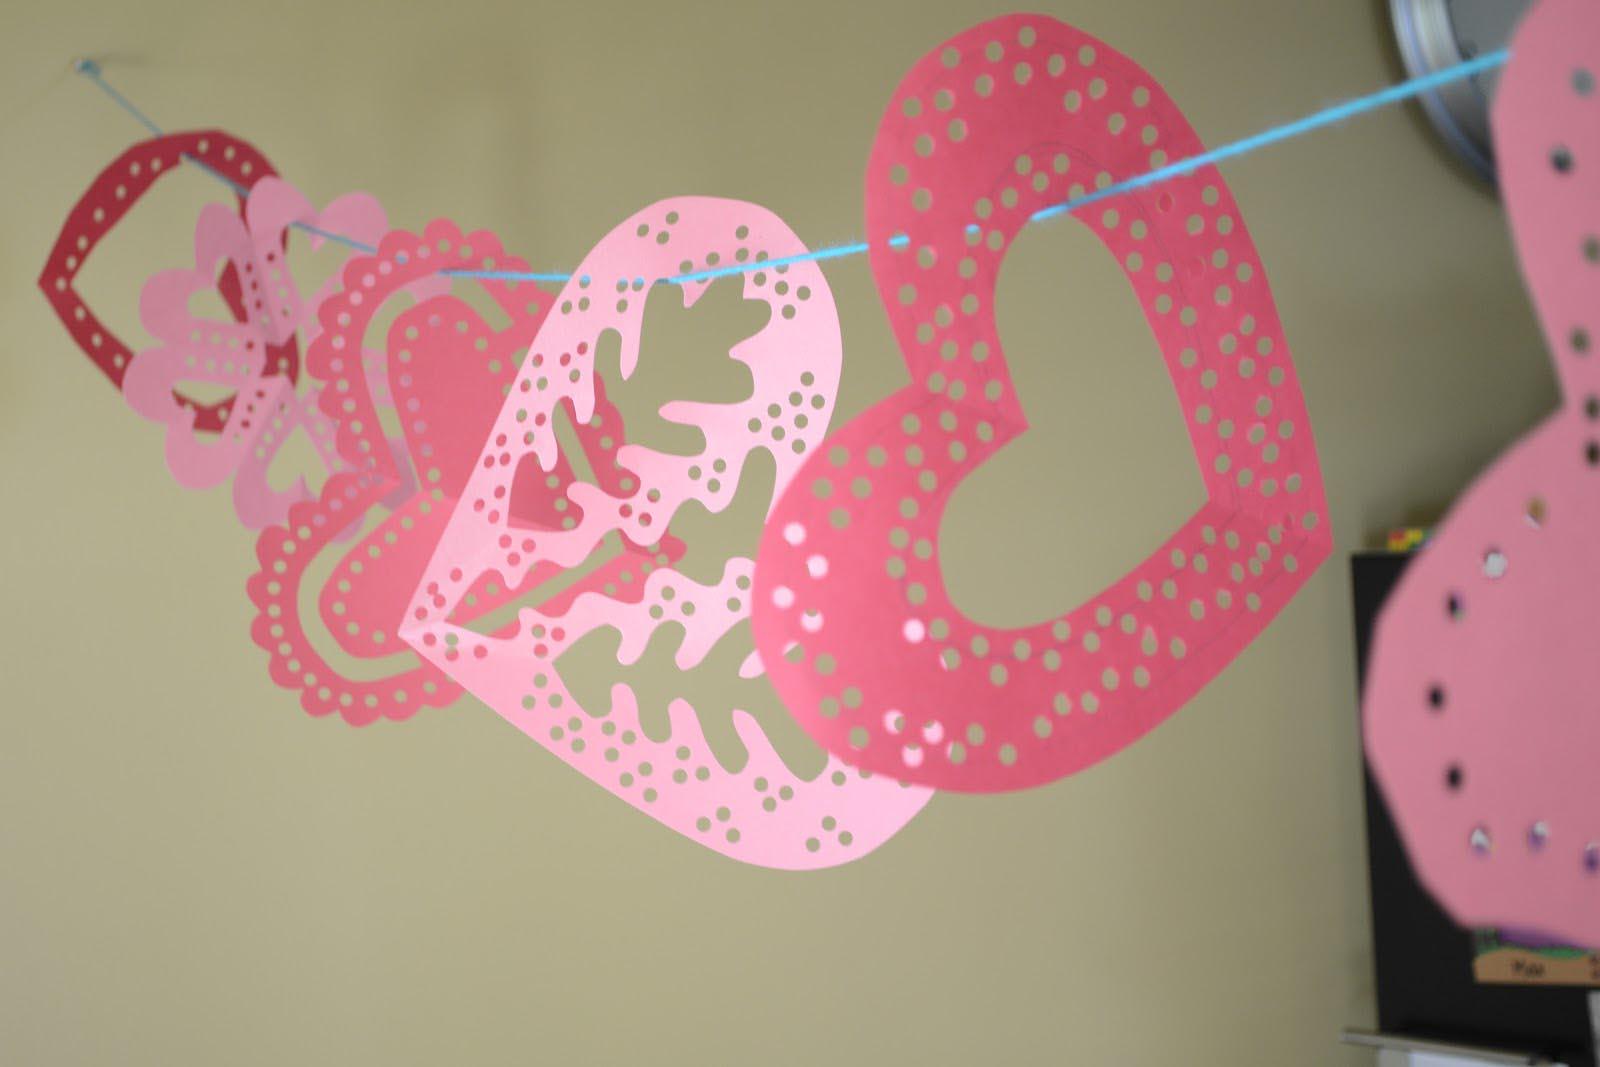 DIY Hanging Heart Decoration diy heart decorations